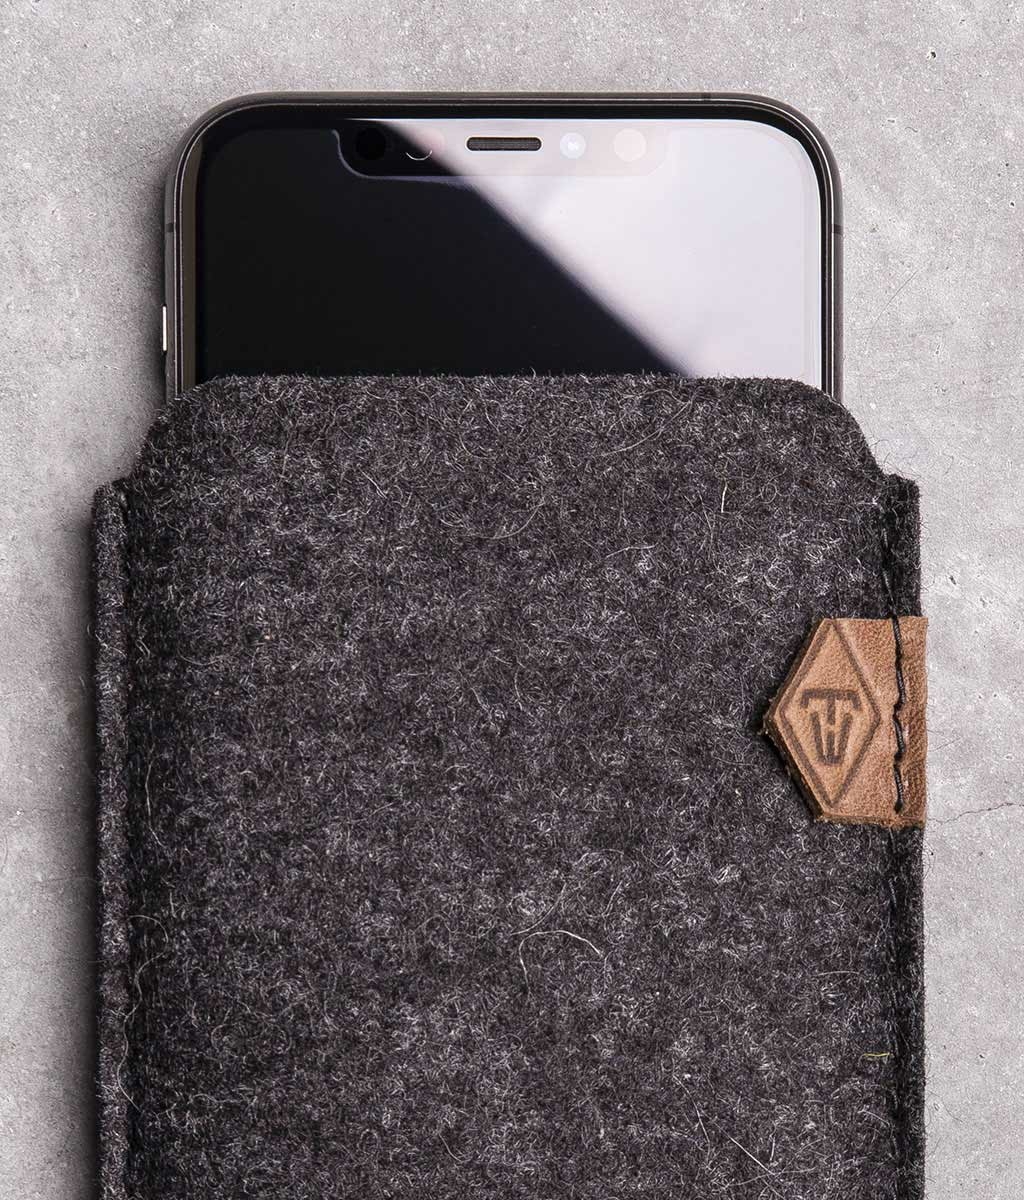 iPhone 11, Pro, Max, SE, XR felt sleeve phone case SOFTWERK 2.0